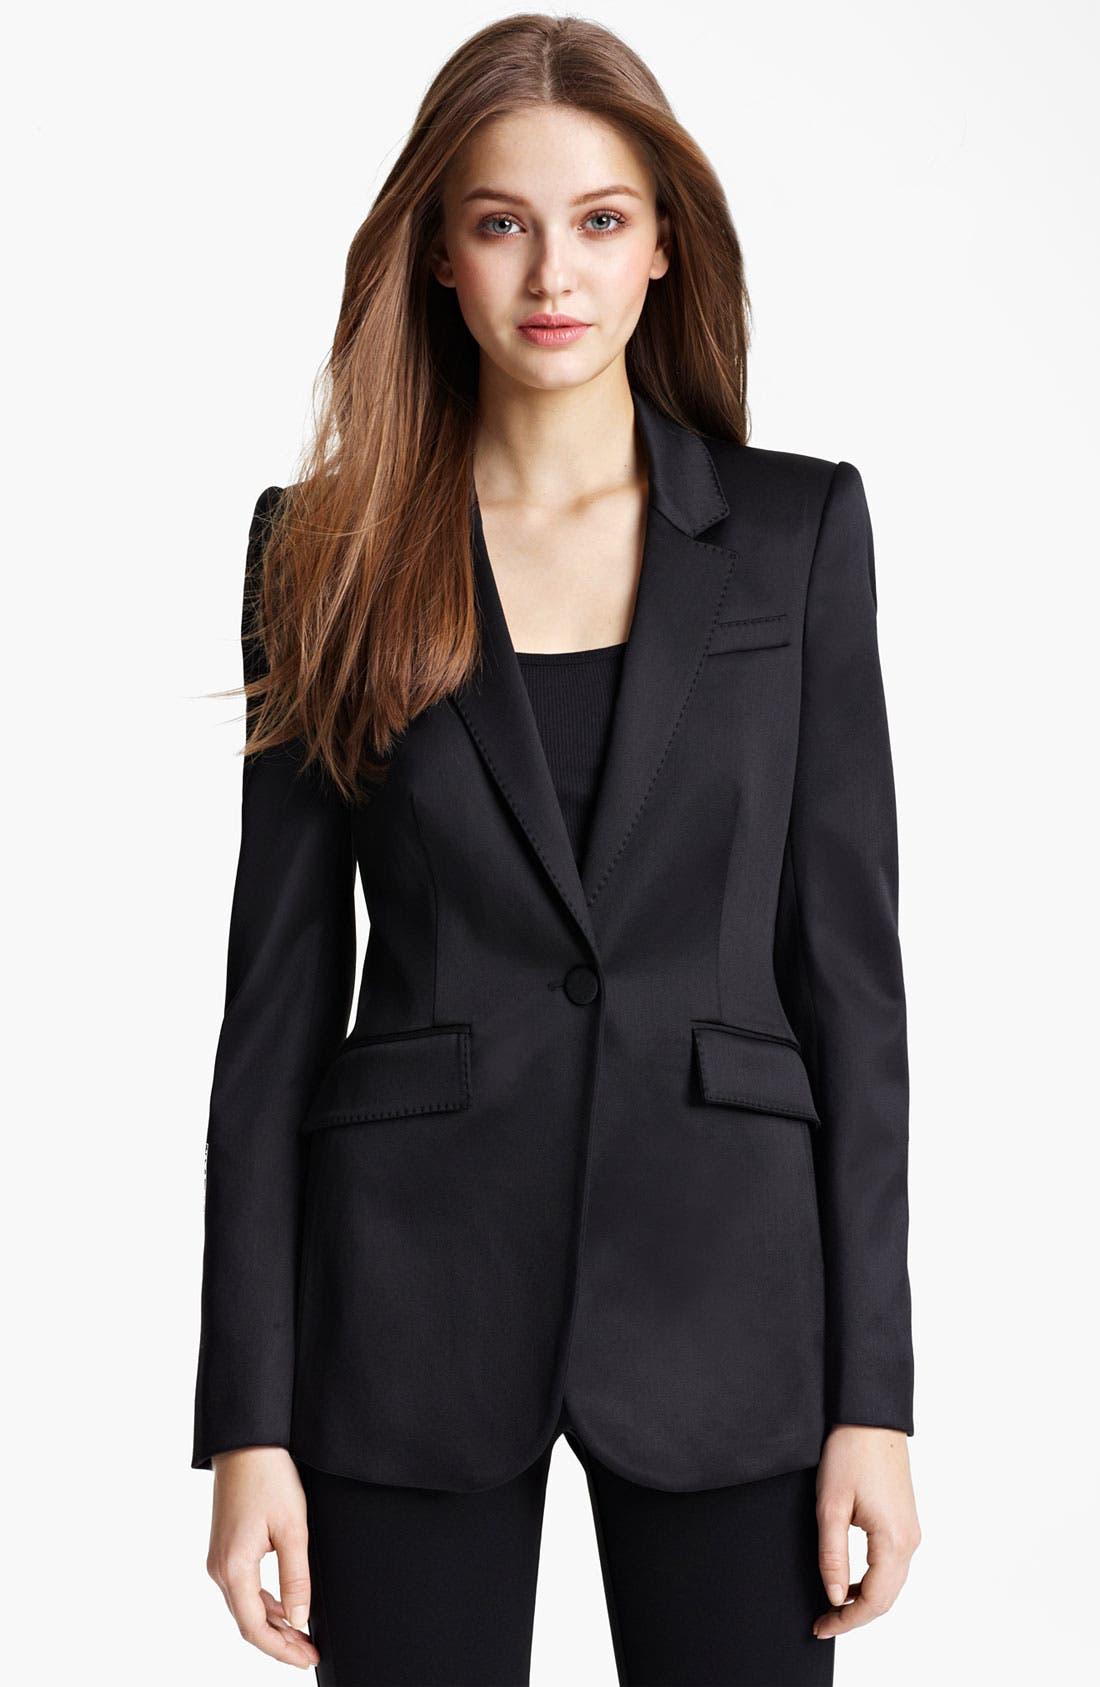 Alternate Image 1 Selected - Burberry London Satin Tuxedo Jacket